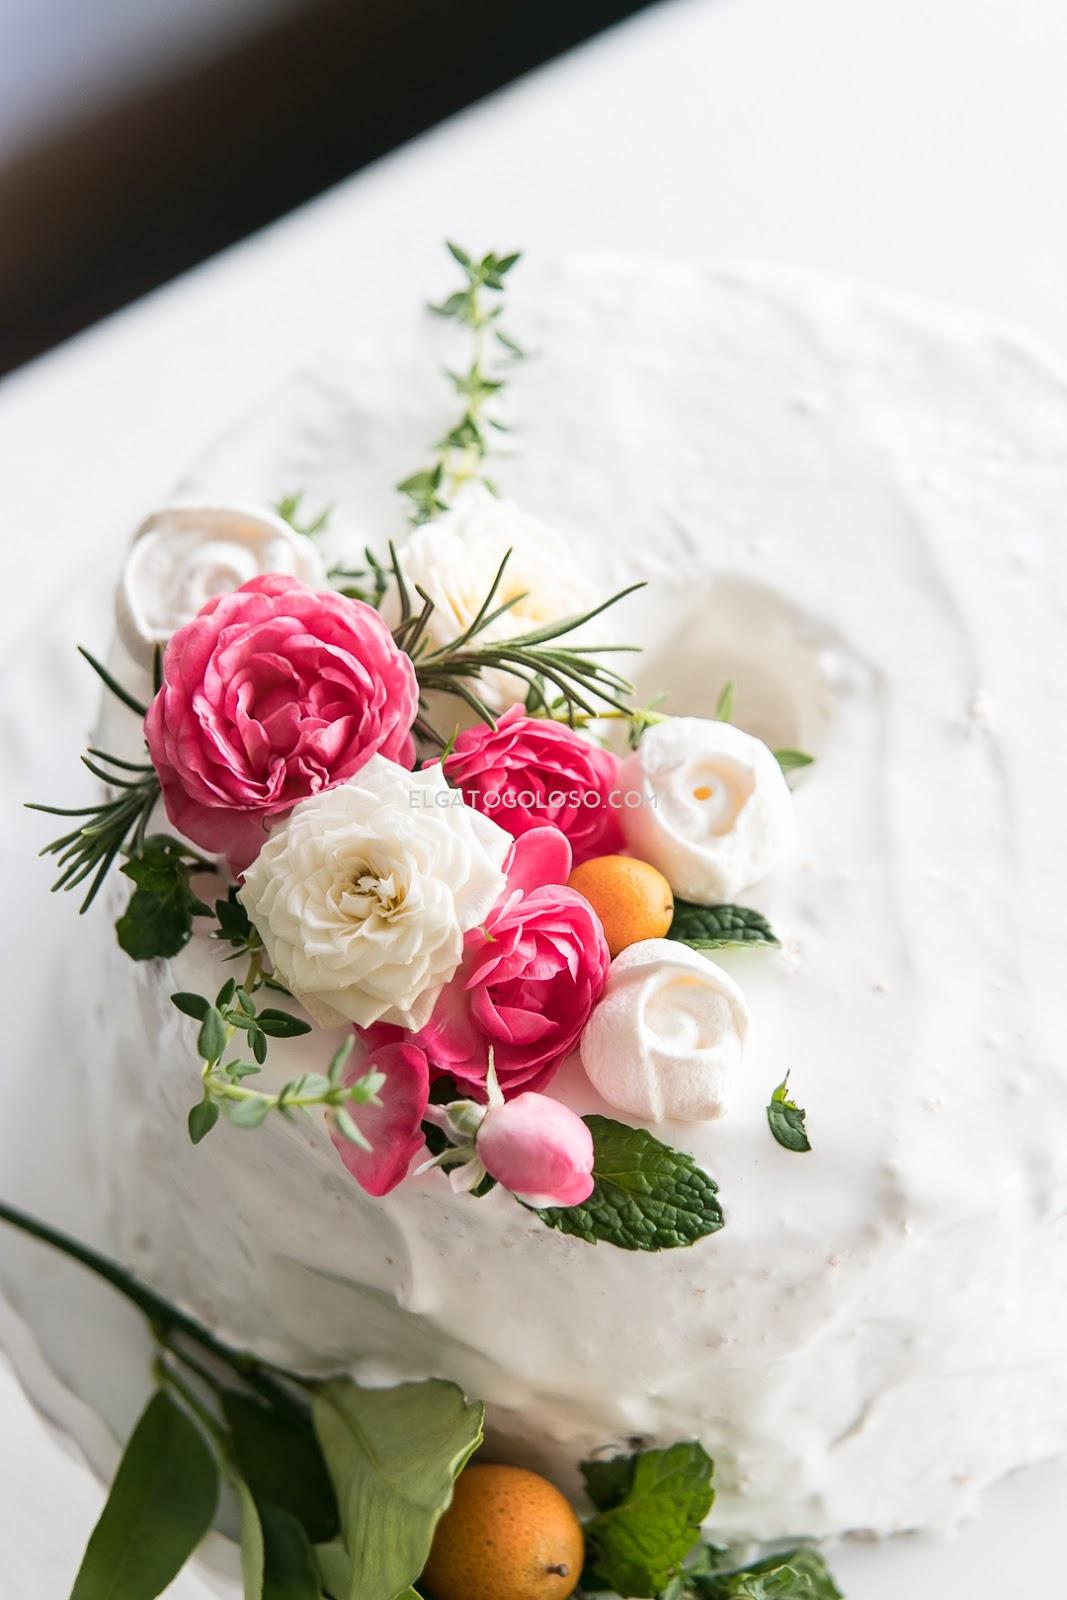 Receta para el dia de las madres chiffon de rosas via elgatogoloso.com